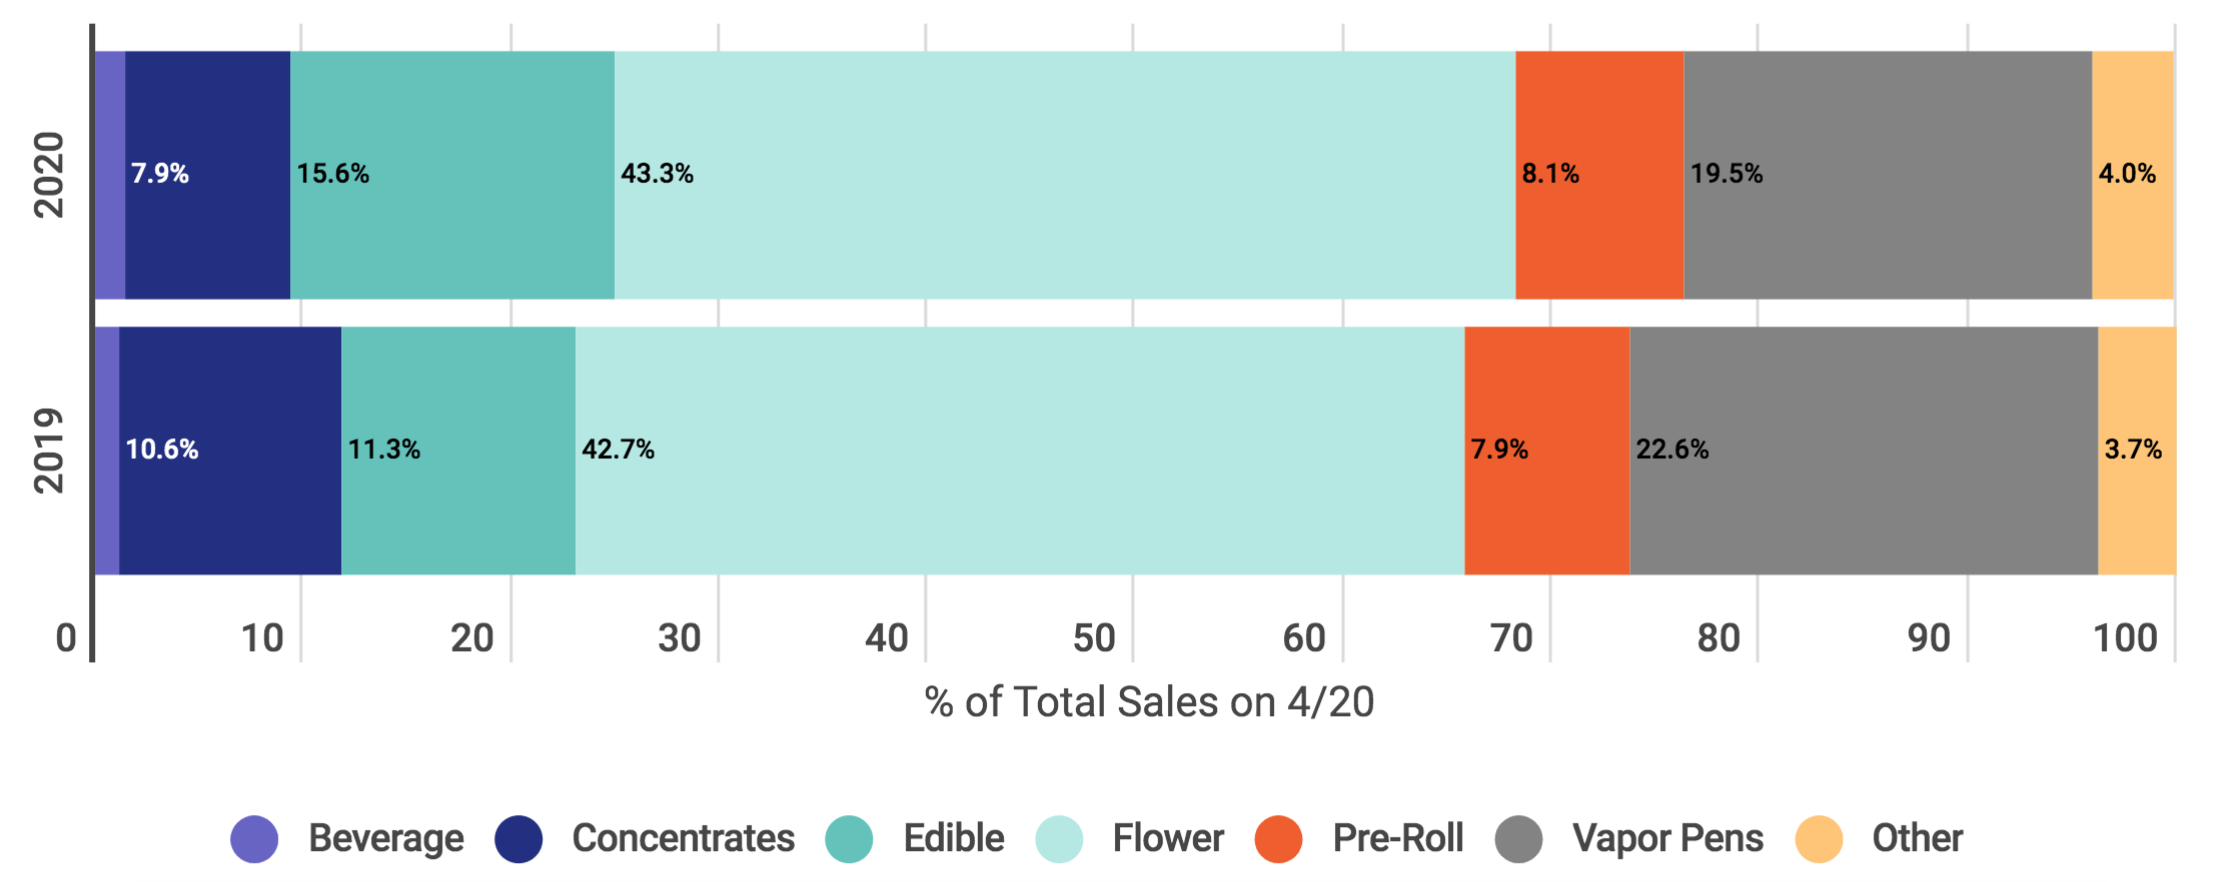 Cannabis category market share on 4/20